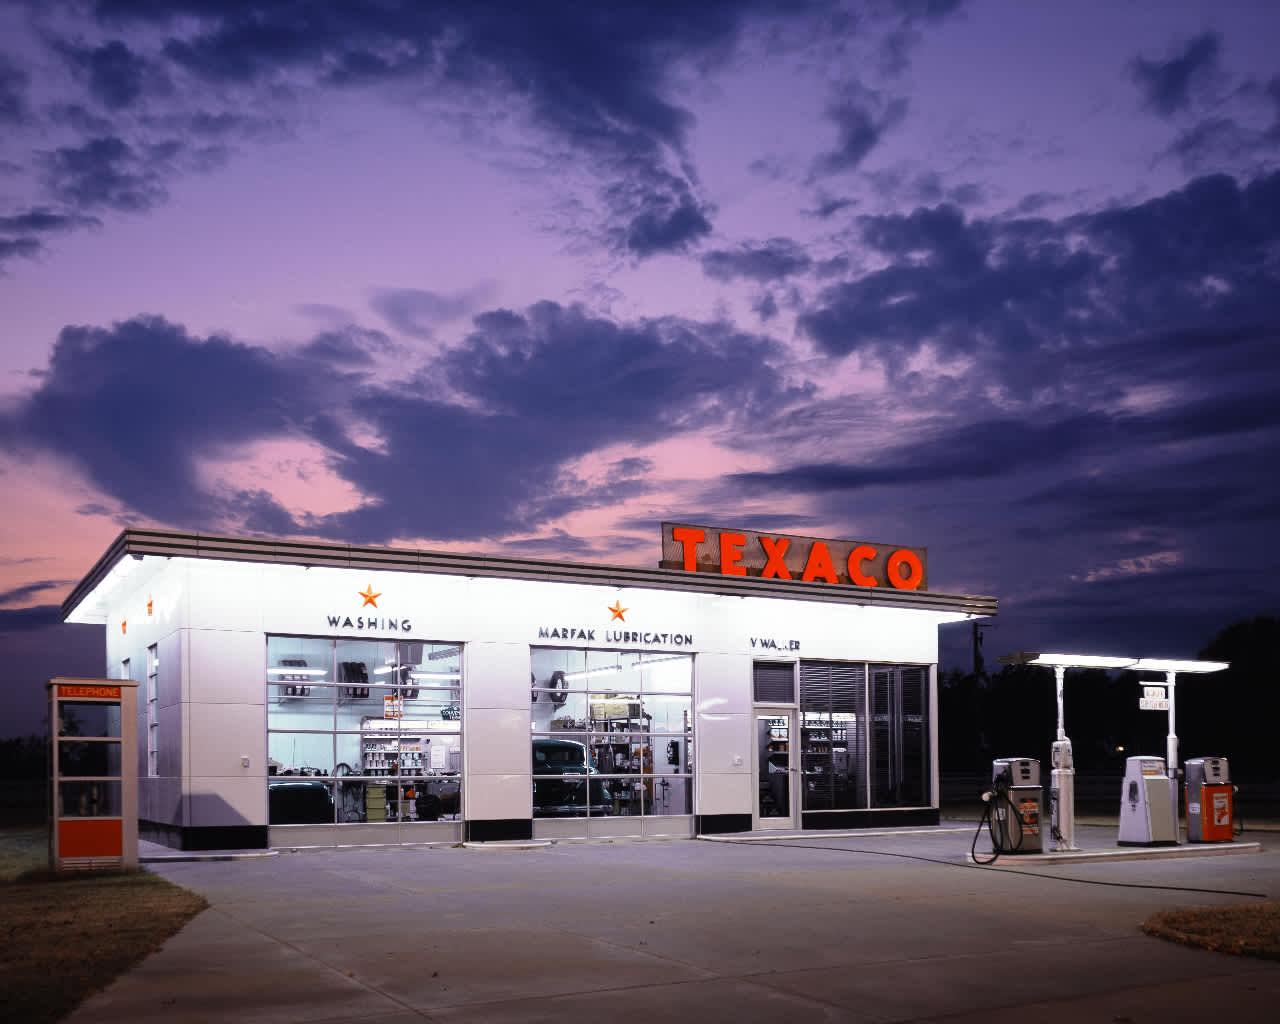 Retro Texaco fuel station